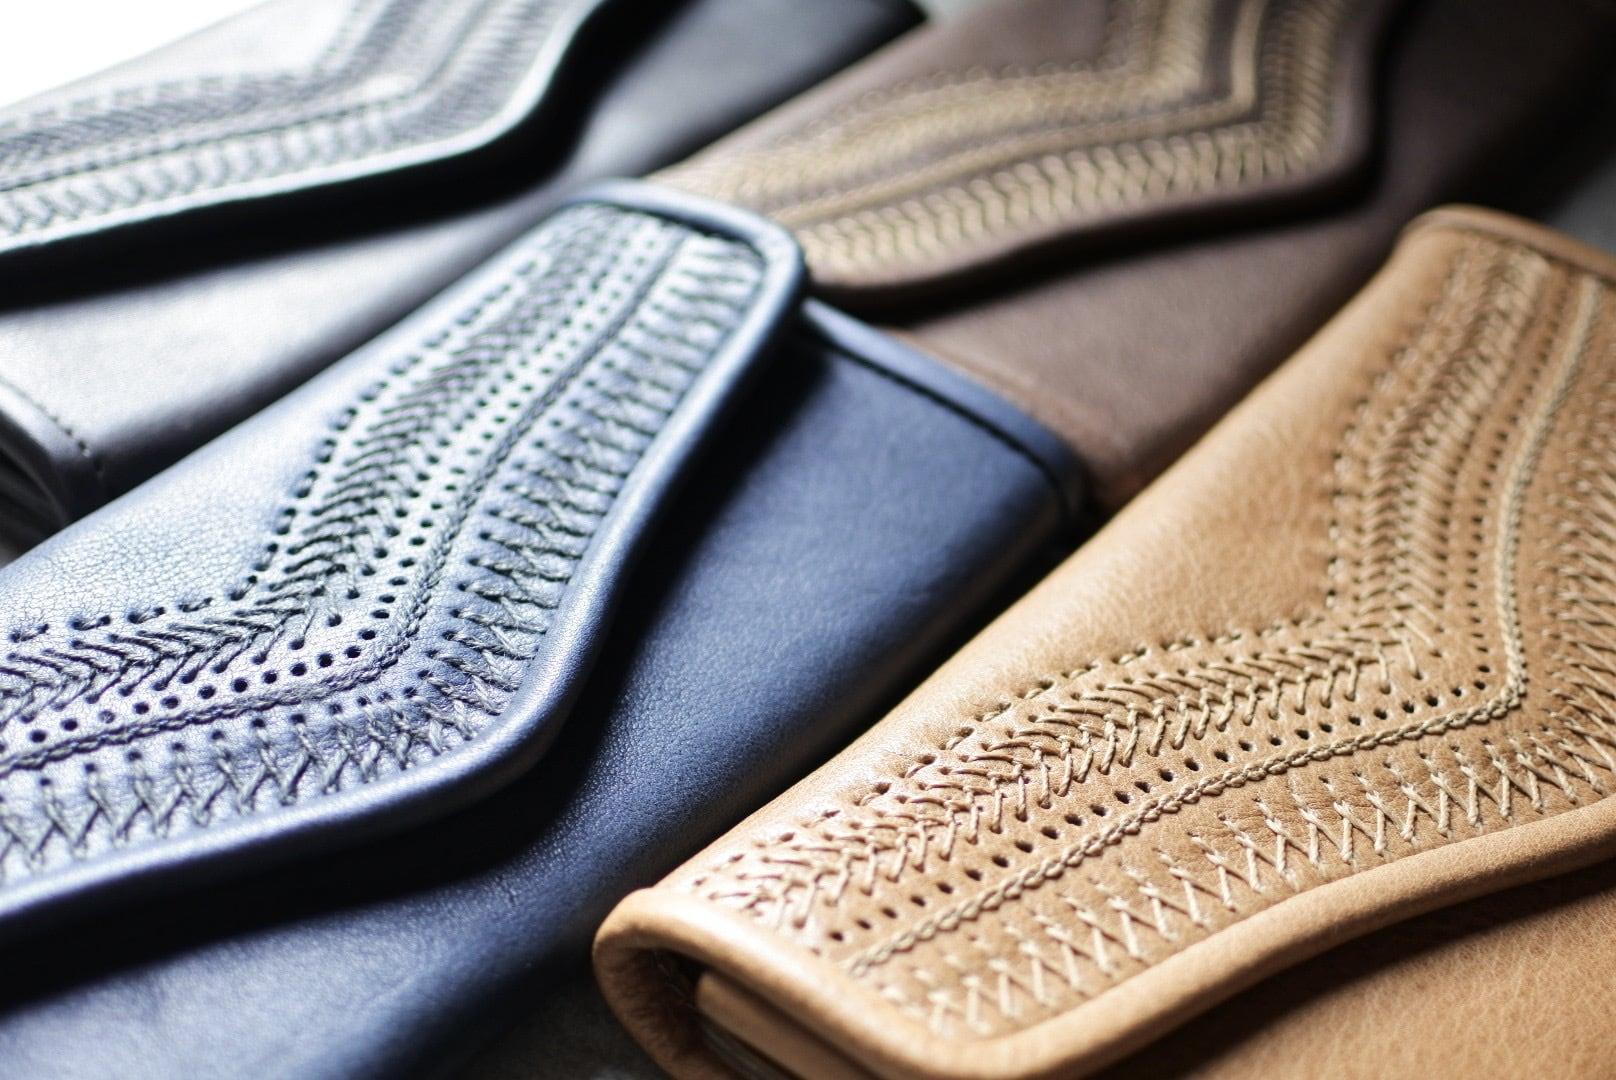 Yammart(ヤマート) / 刺繍ロングウォレット stitch-long-wallet/blue or black